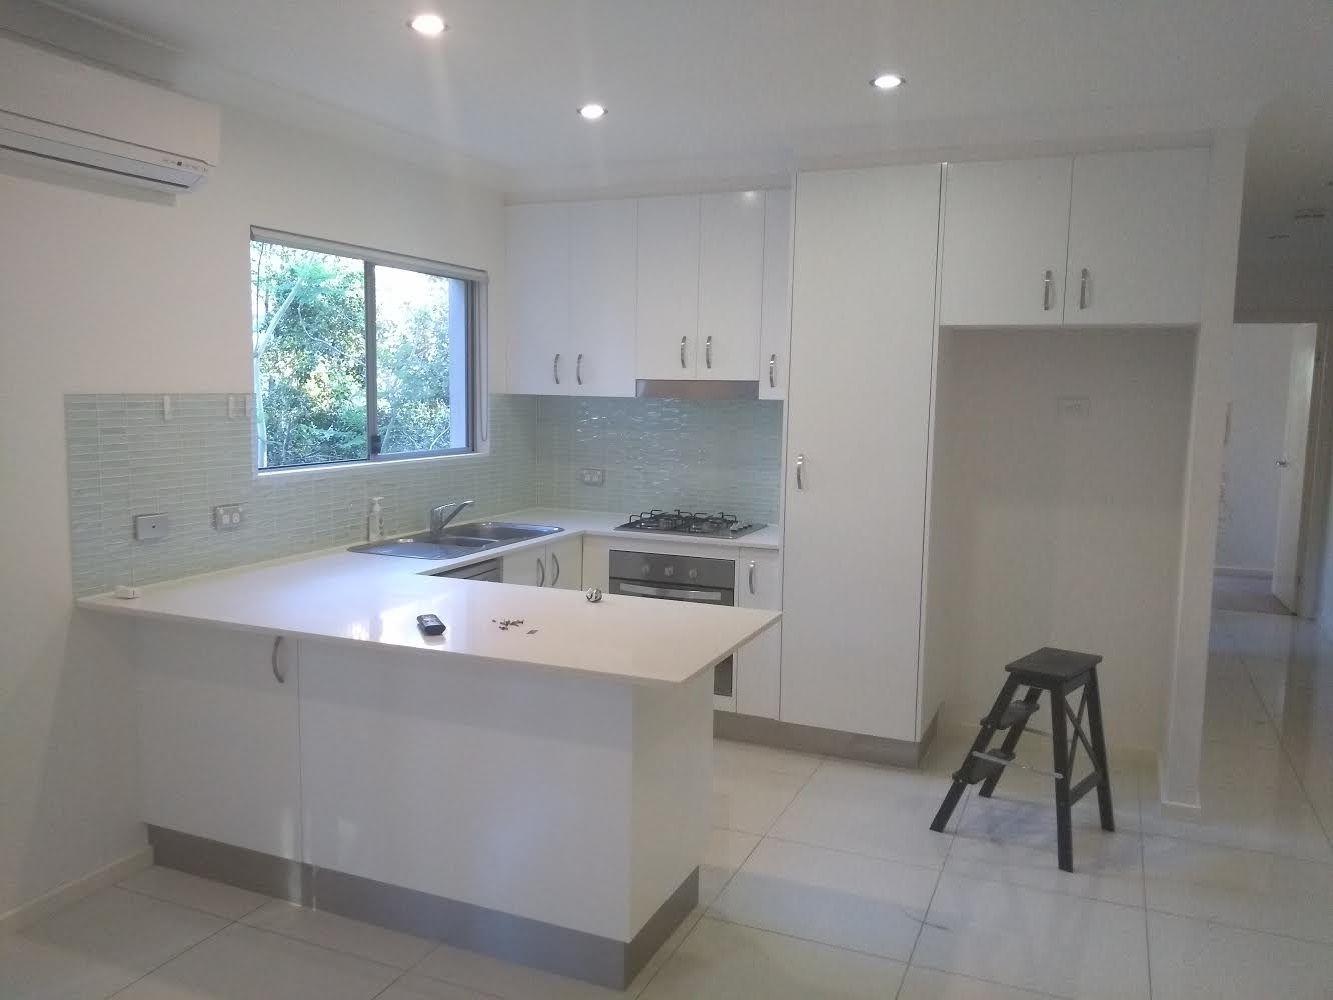 3/53 Douglas Street, Greenslopes QLD 4120, Image 1